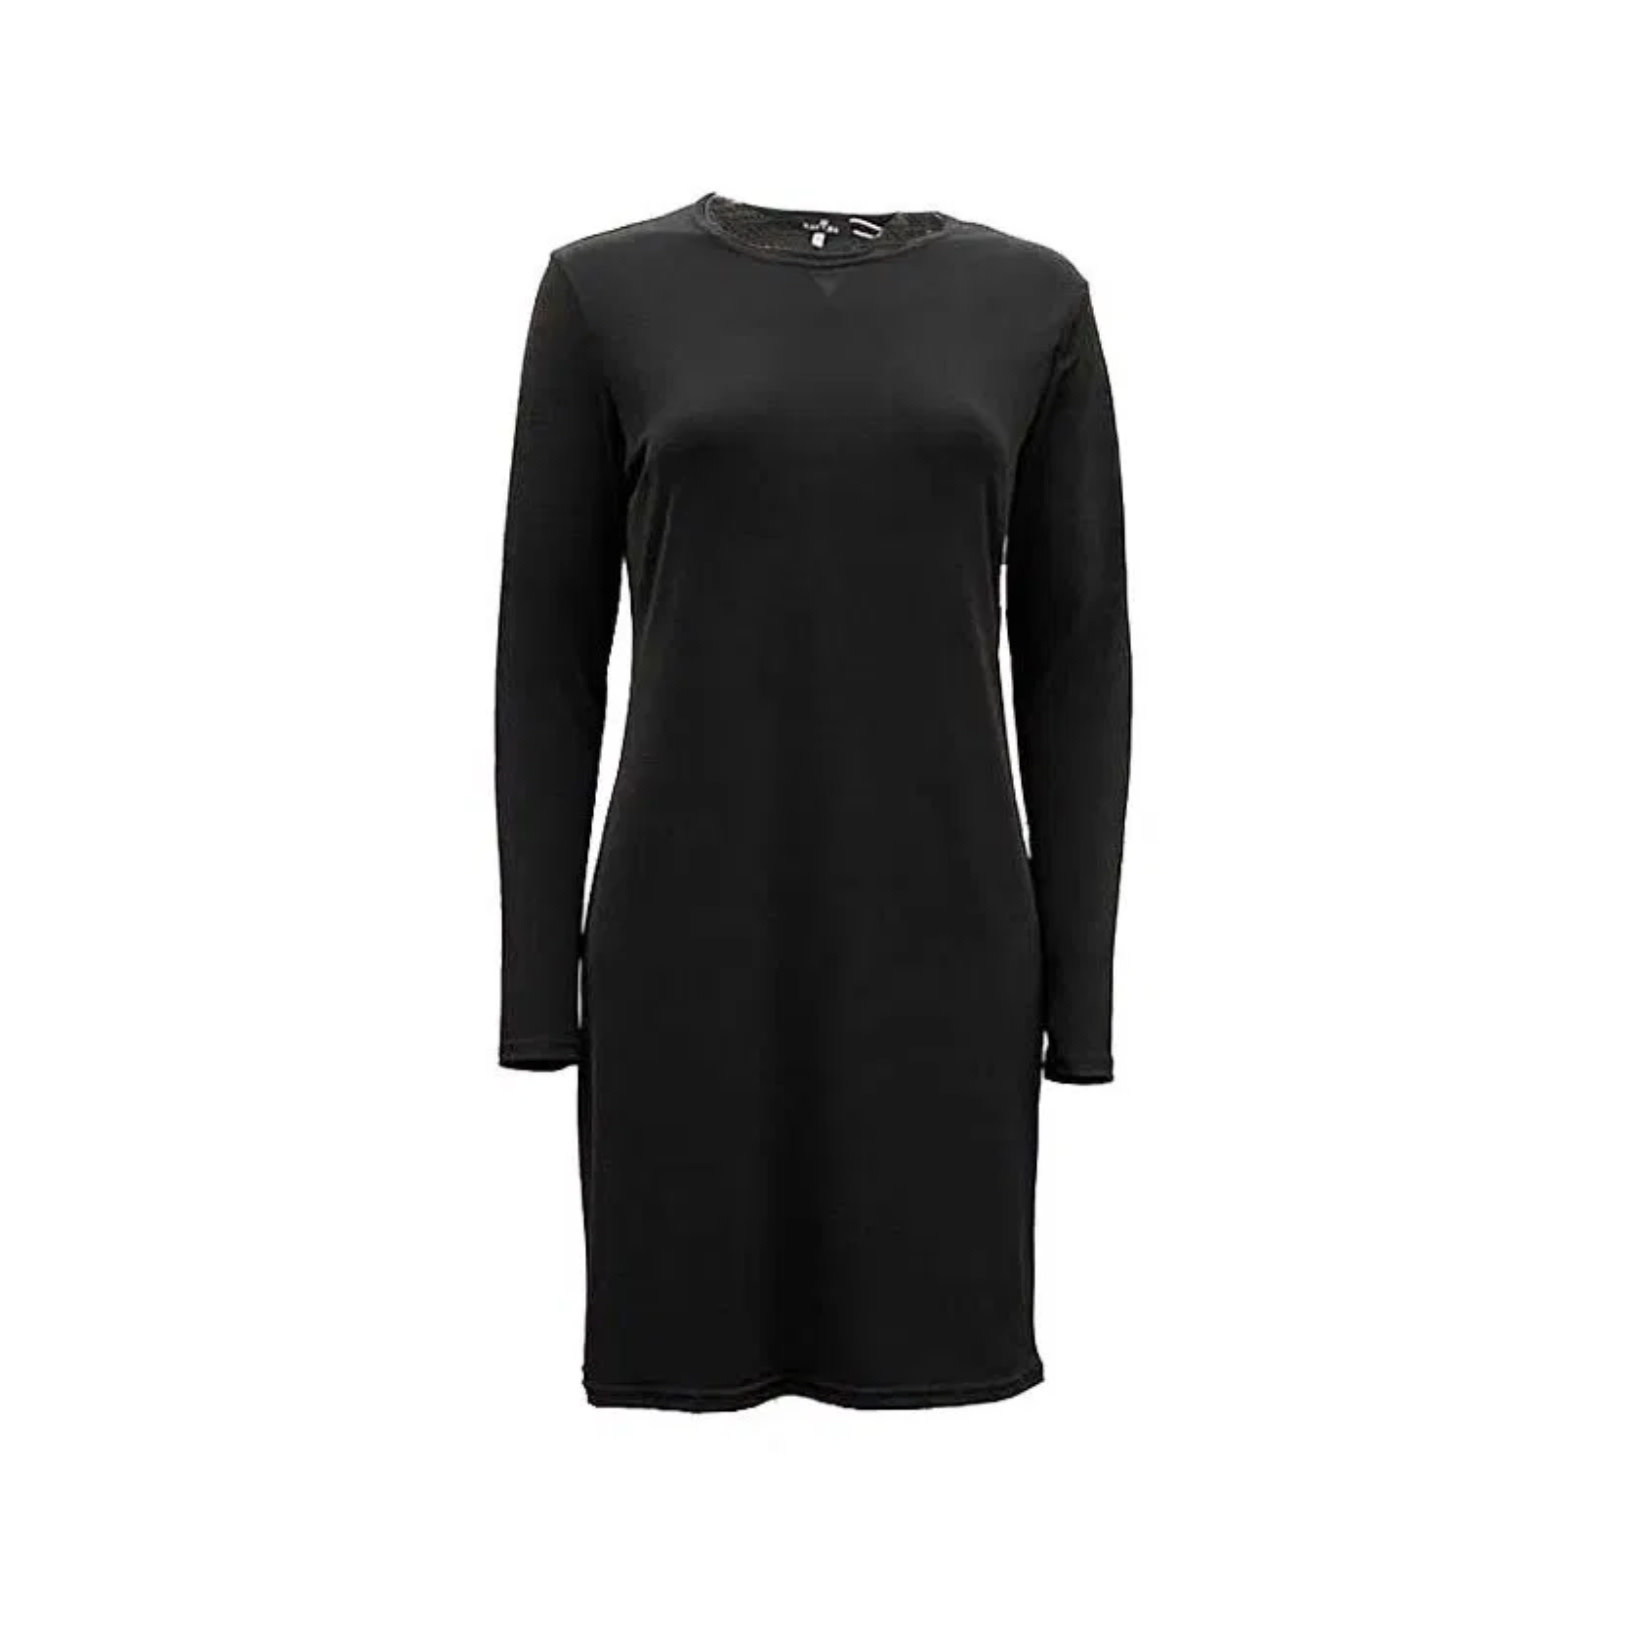 Nasiba Fashion Black Lycra Long top